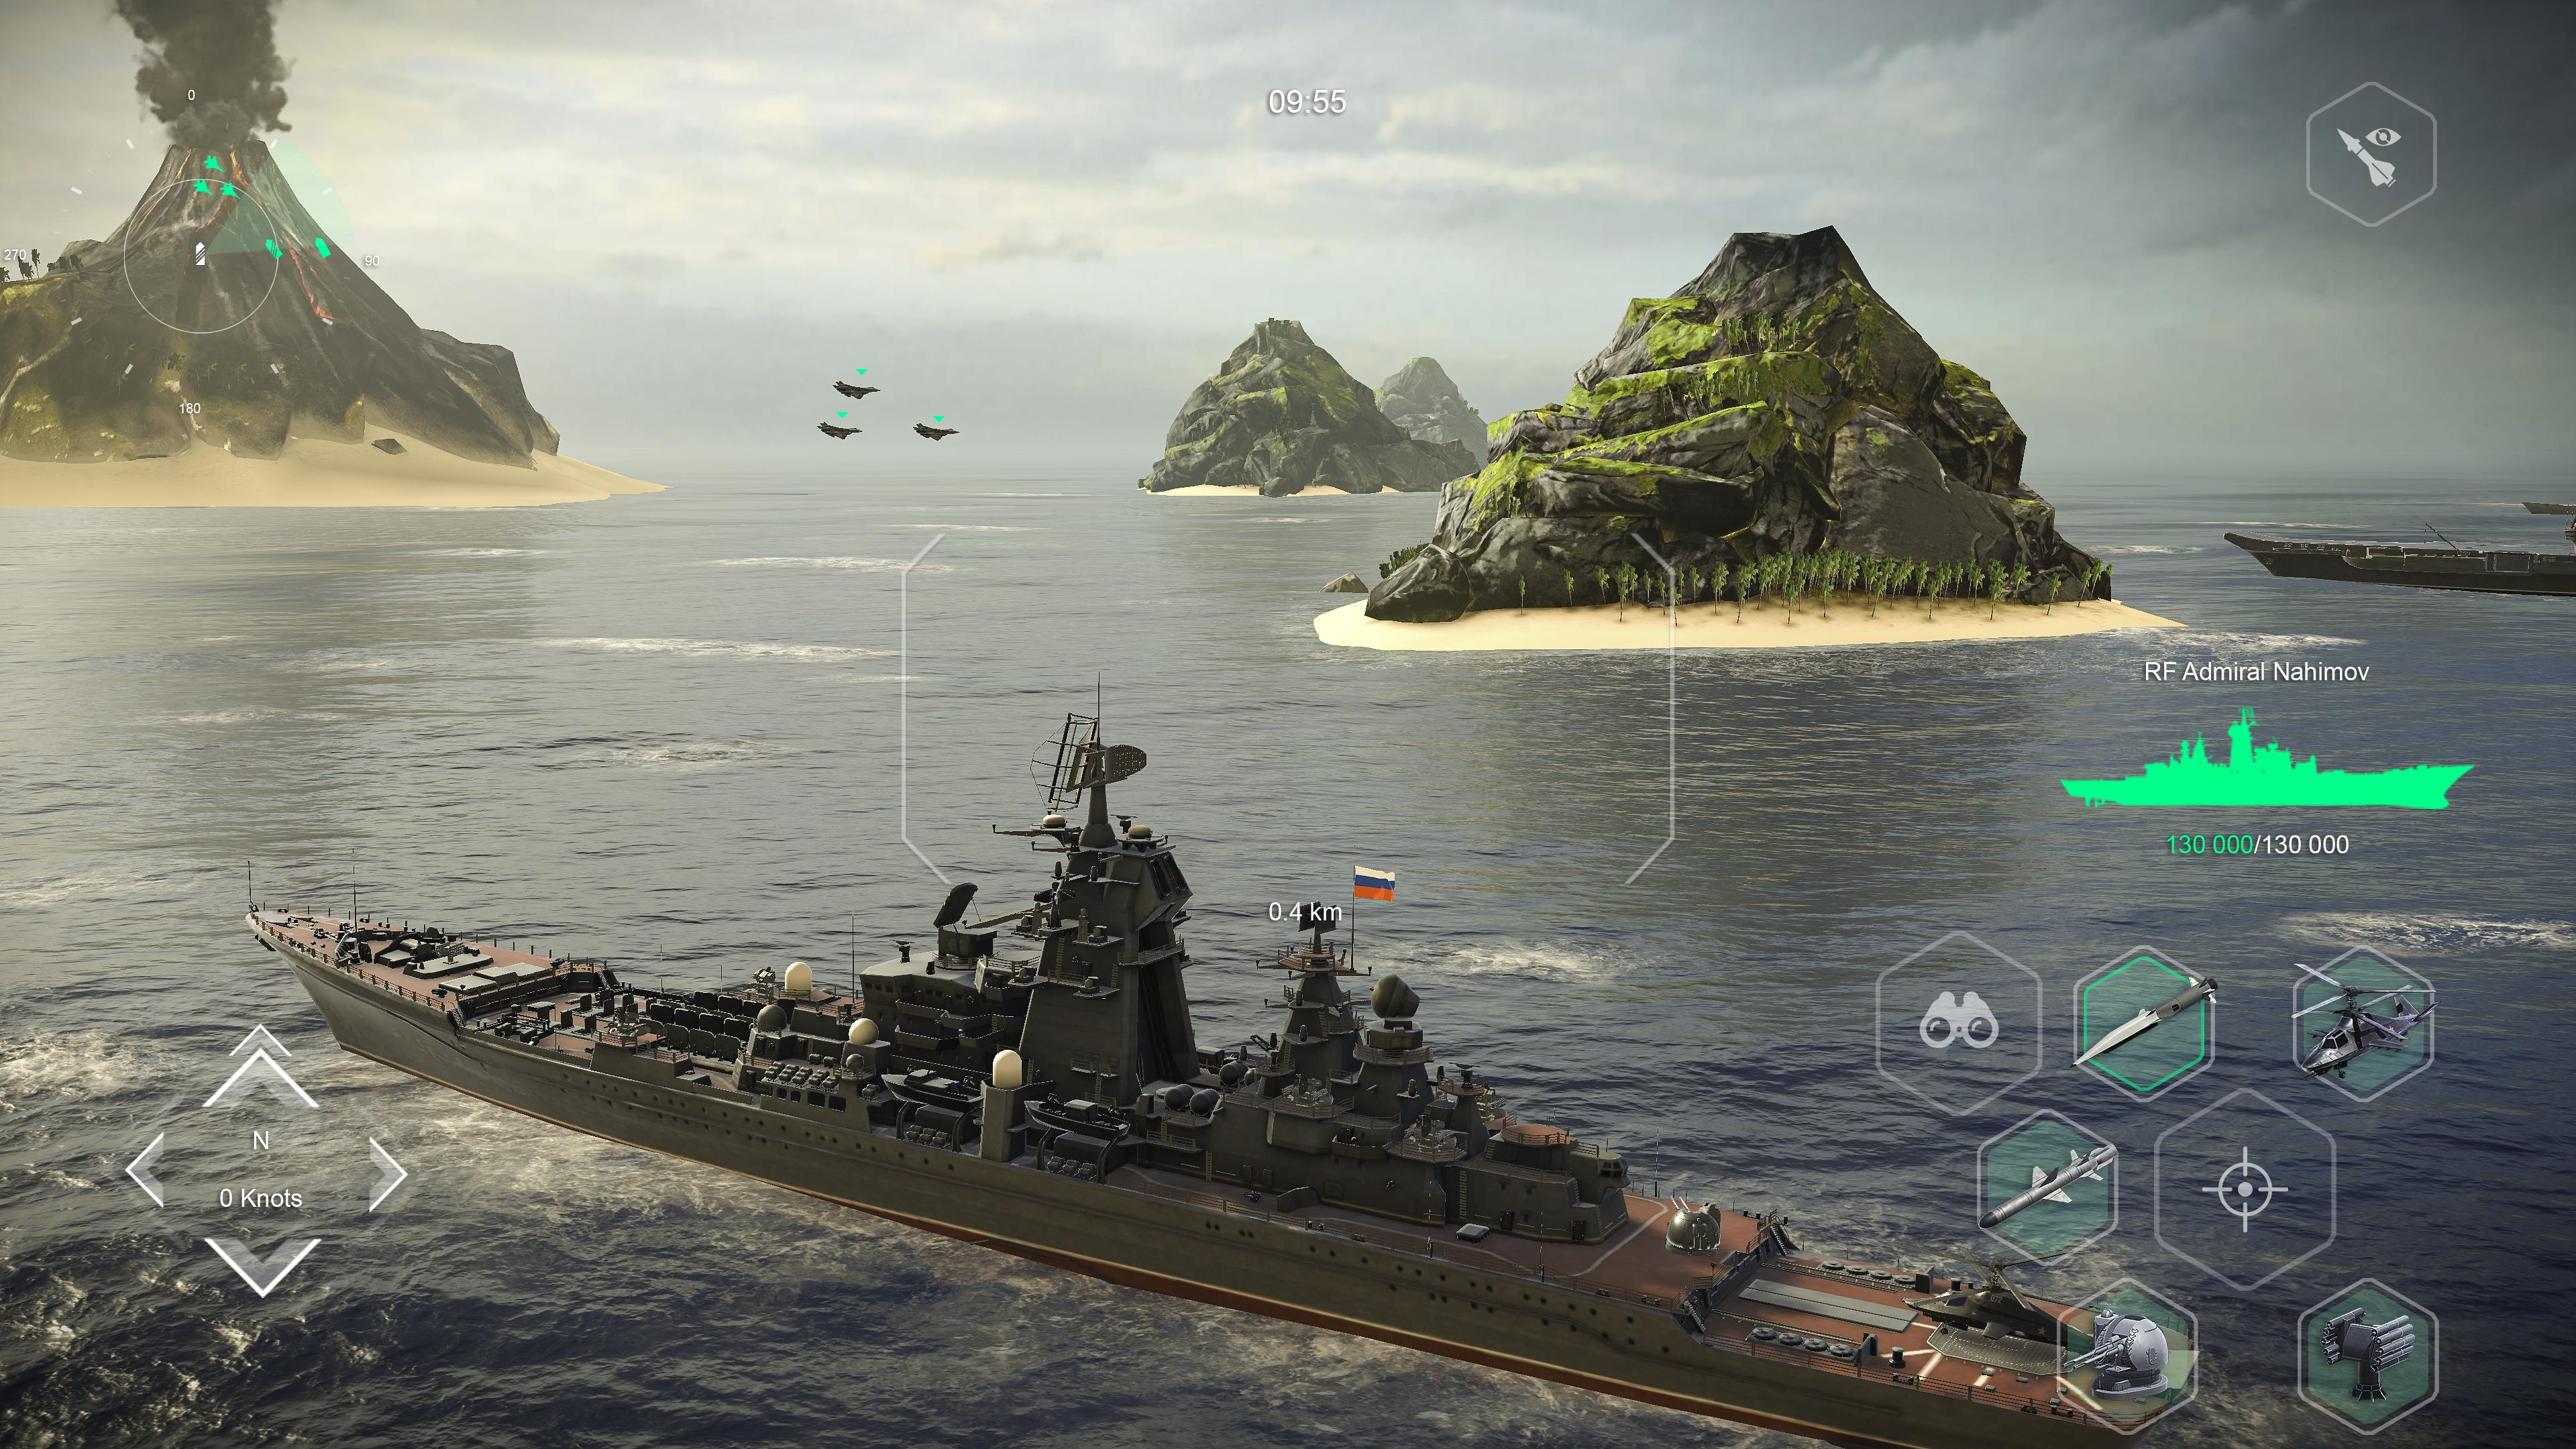 Военно-морской экшен Modern Warships стал доступен на Android!